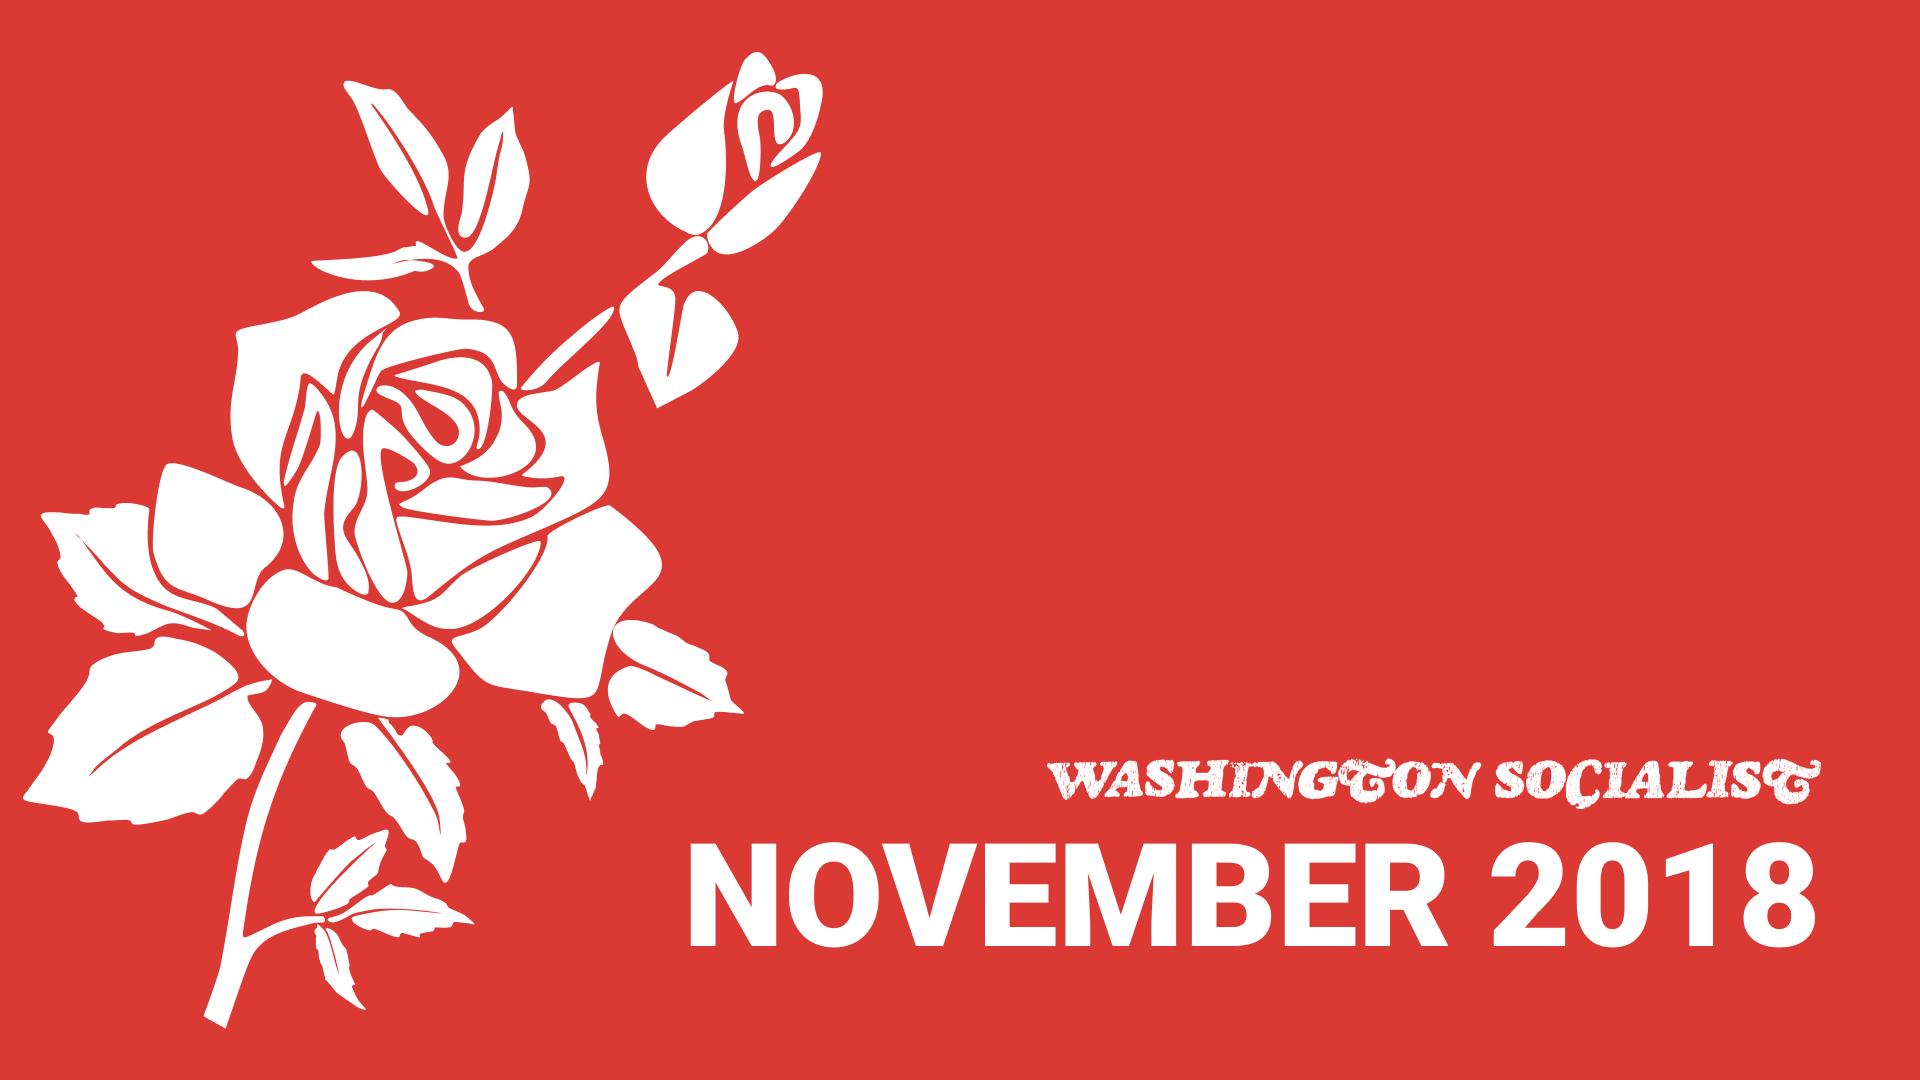 Washington Socialist Cover, November 2018